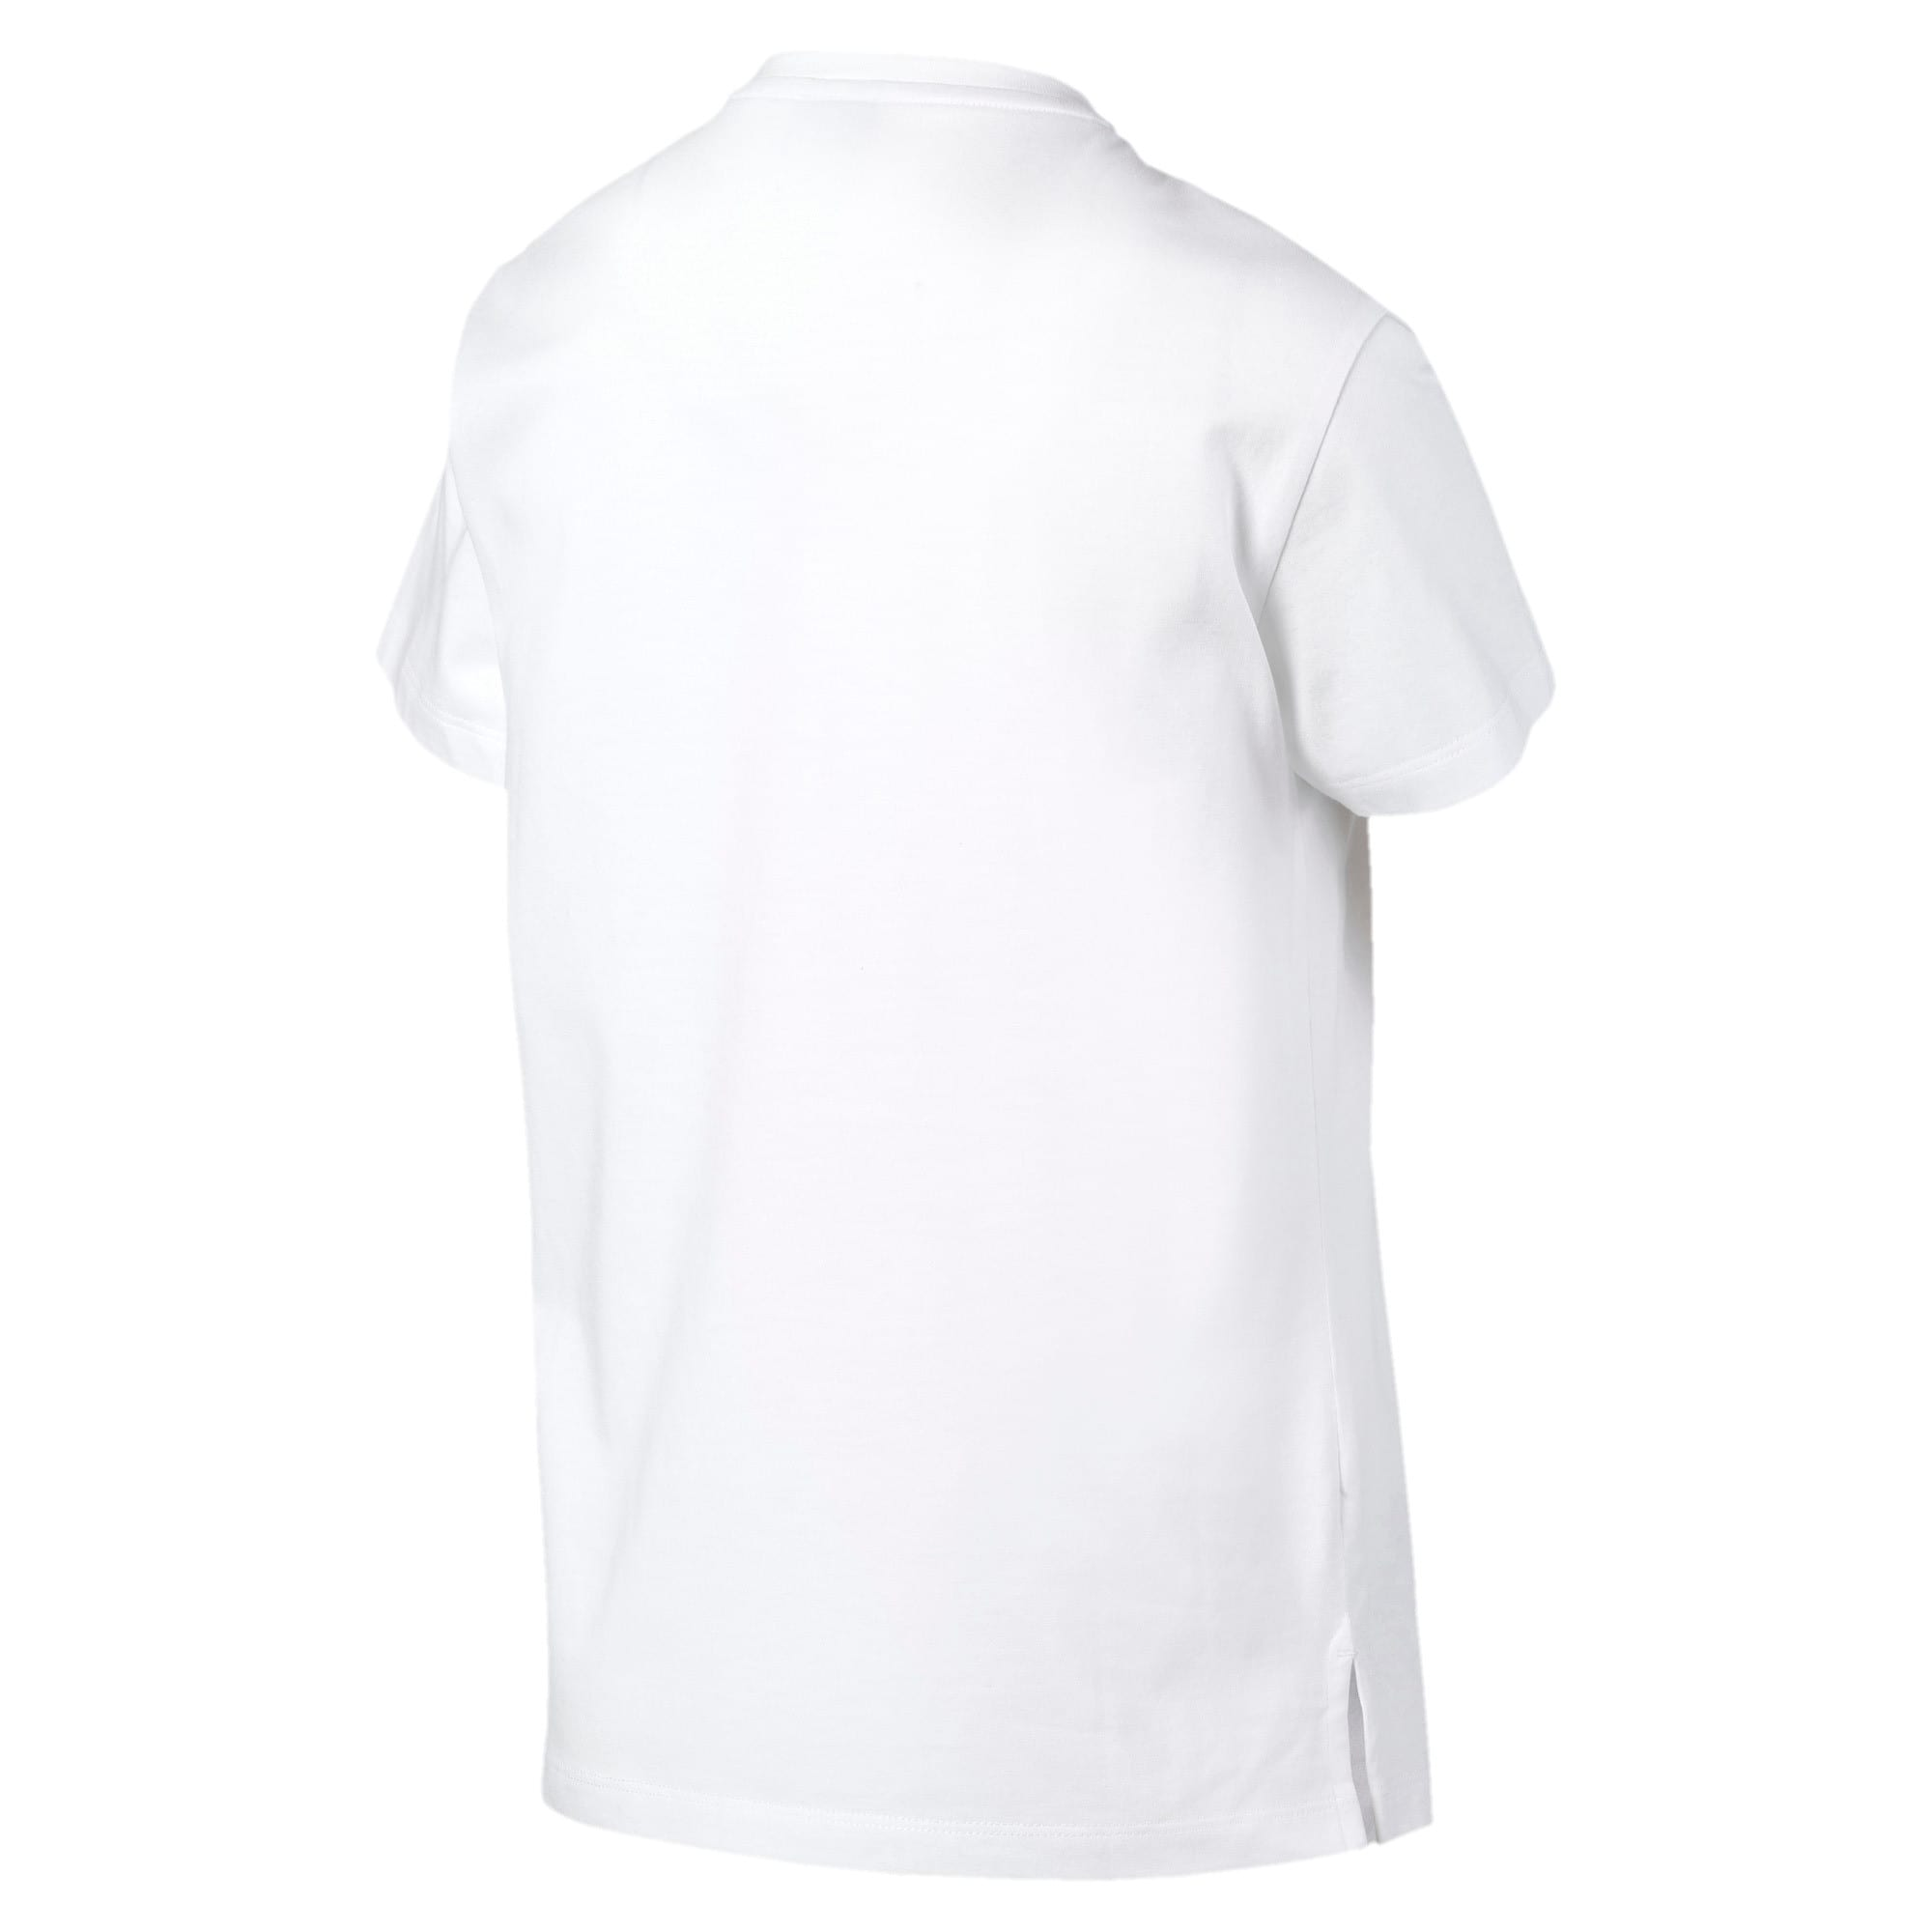 Thumbnail 5 of CLASSICS ロゴ ウィメンズ SS Tシャツ, Puma White, medium-JPN